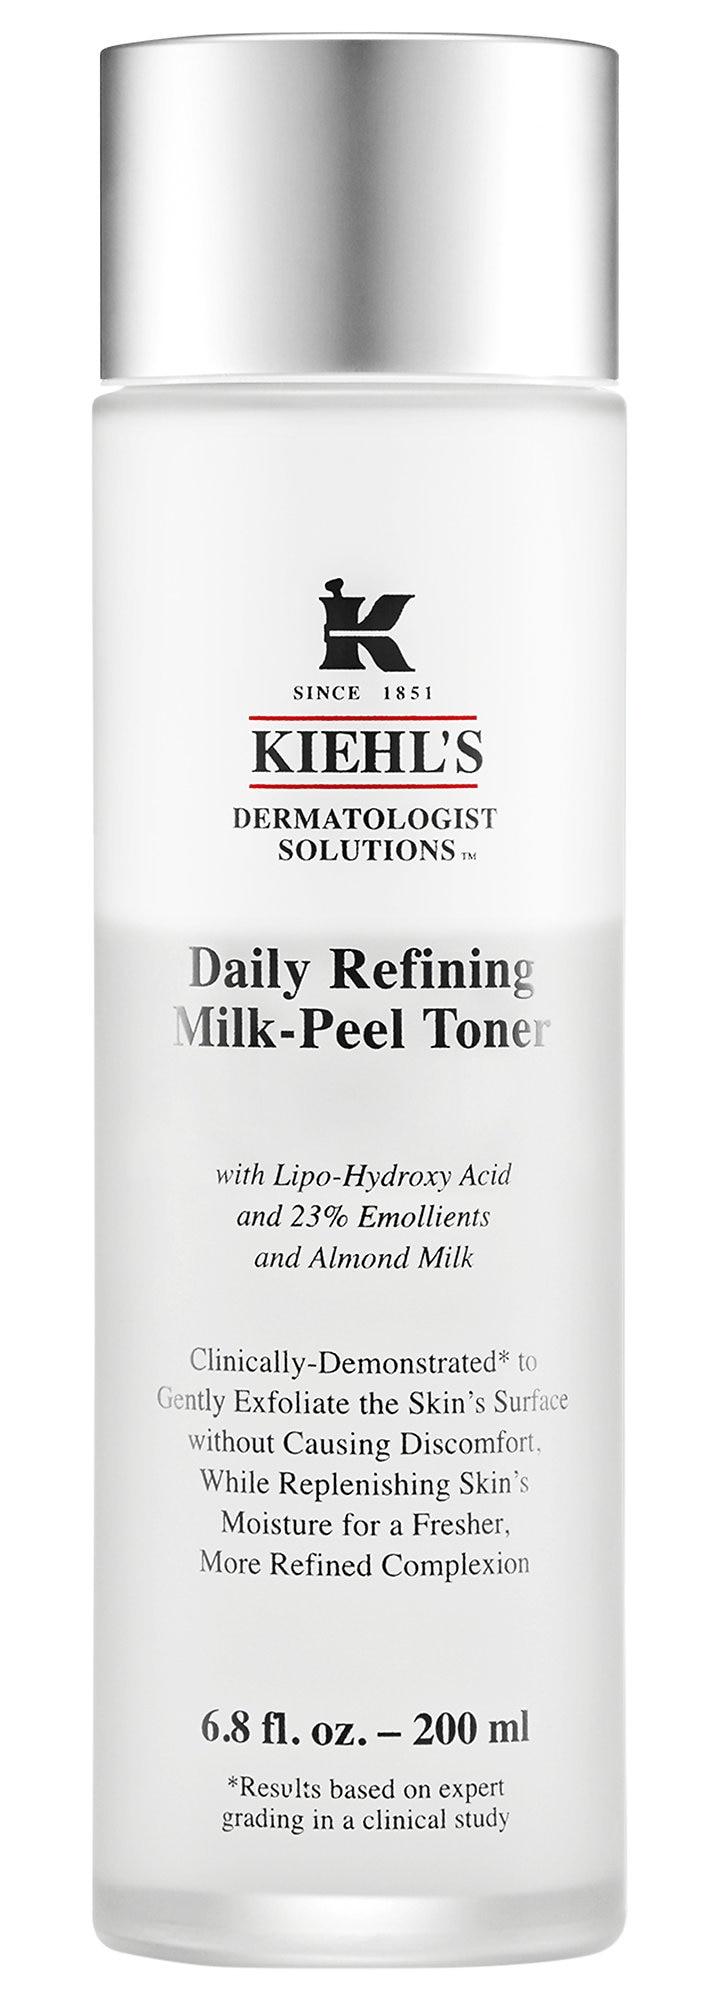 Kiehl's Daily Refining Milk Peel Toner